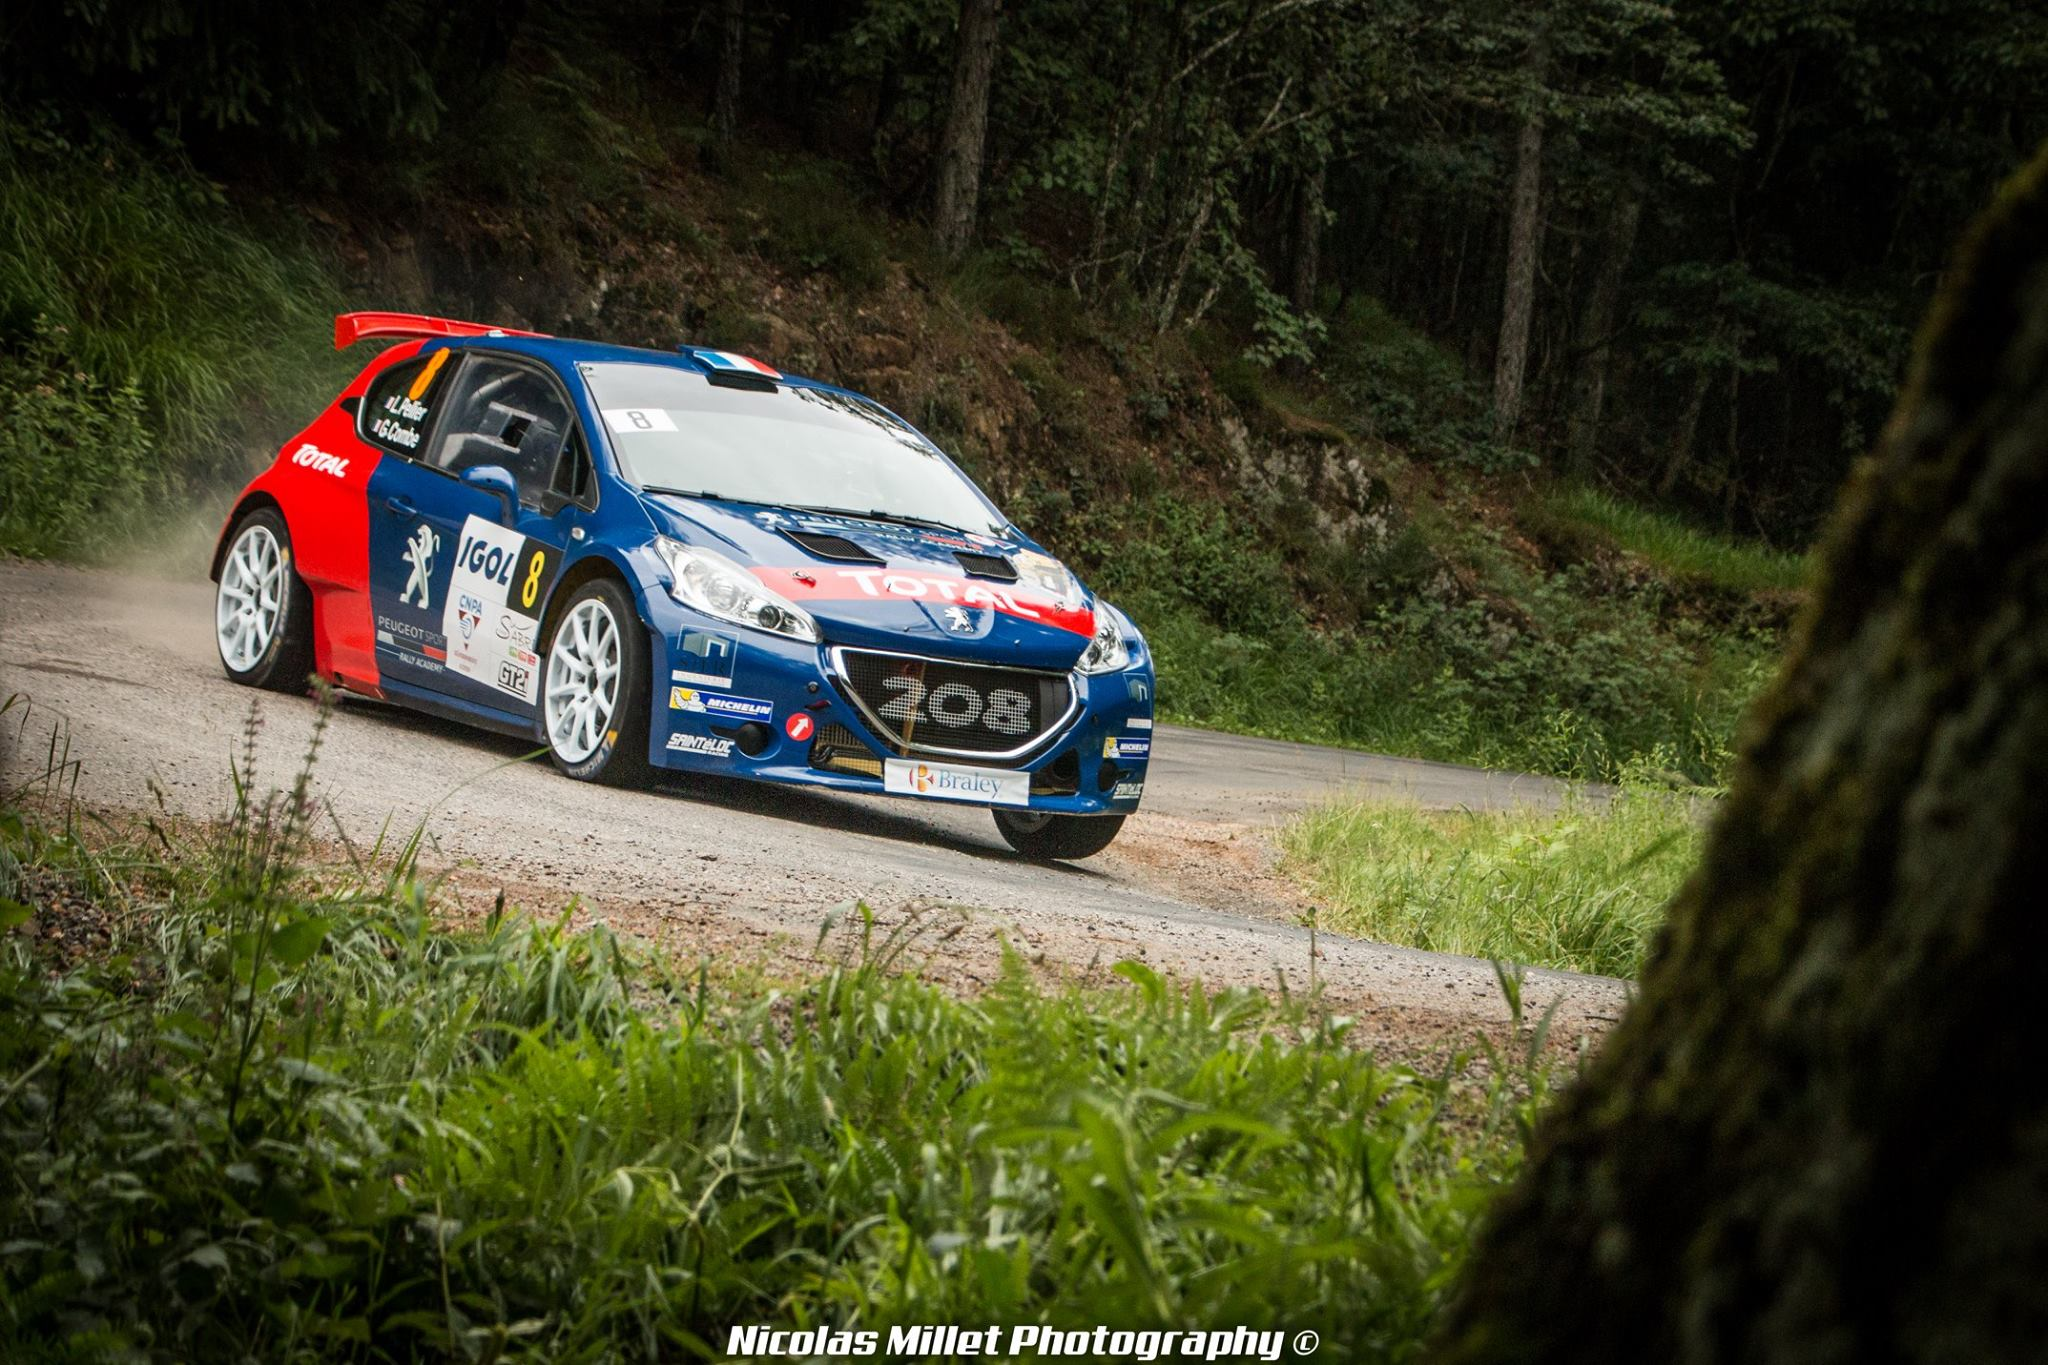 Rallye rouergue 2018